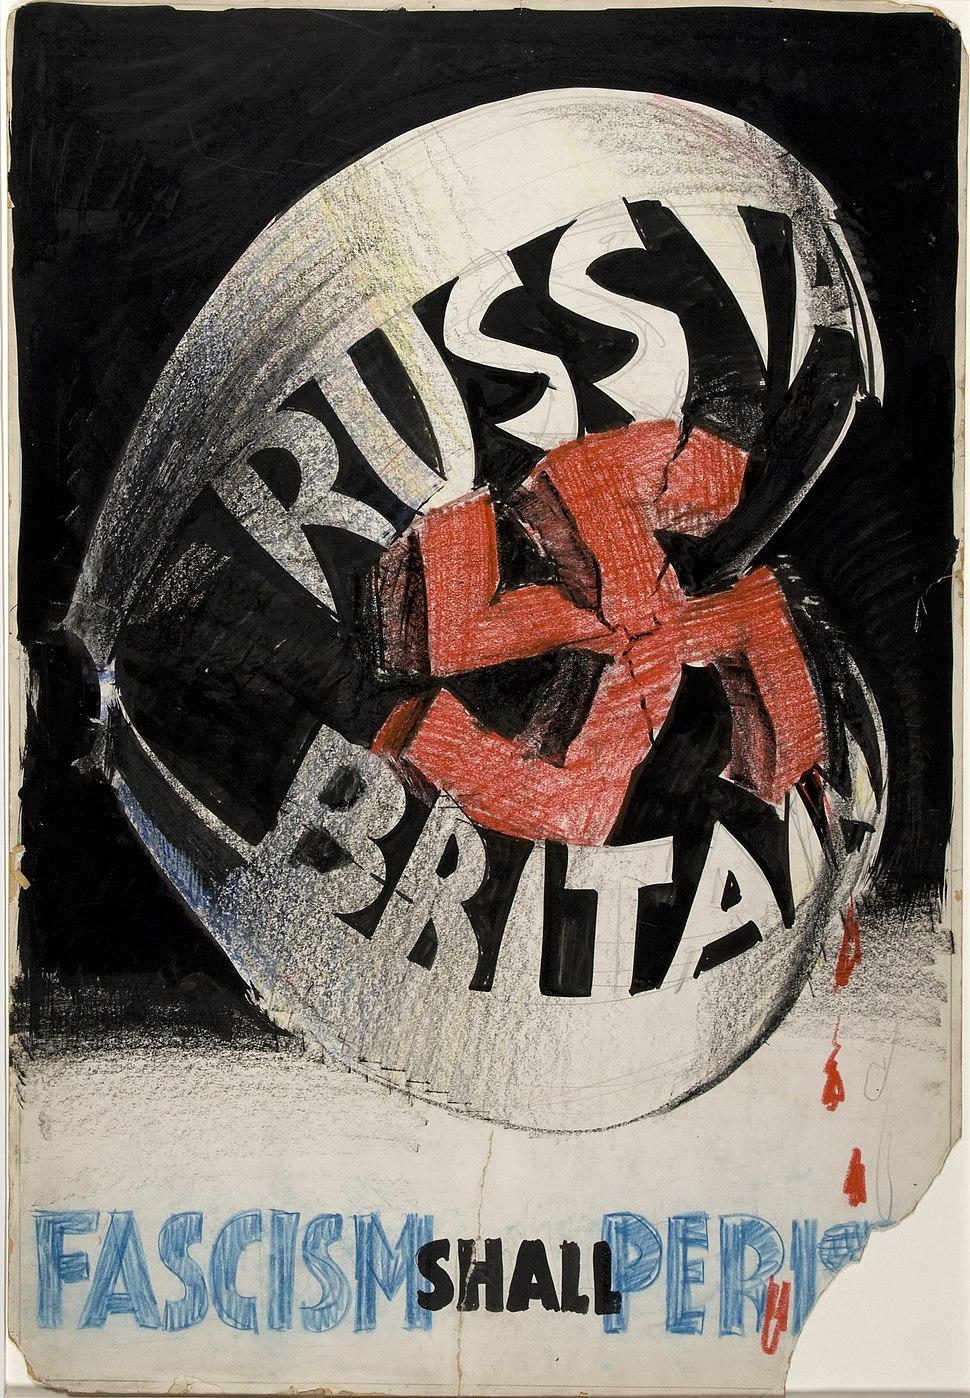 INF3-329 Unity of Strength Fascism shall perish